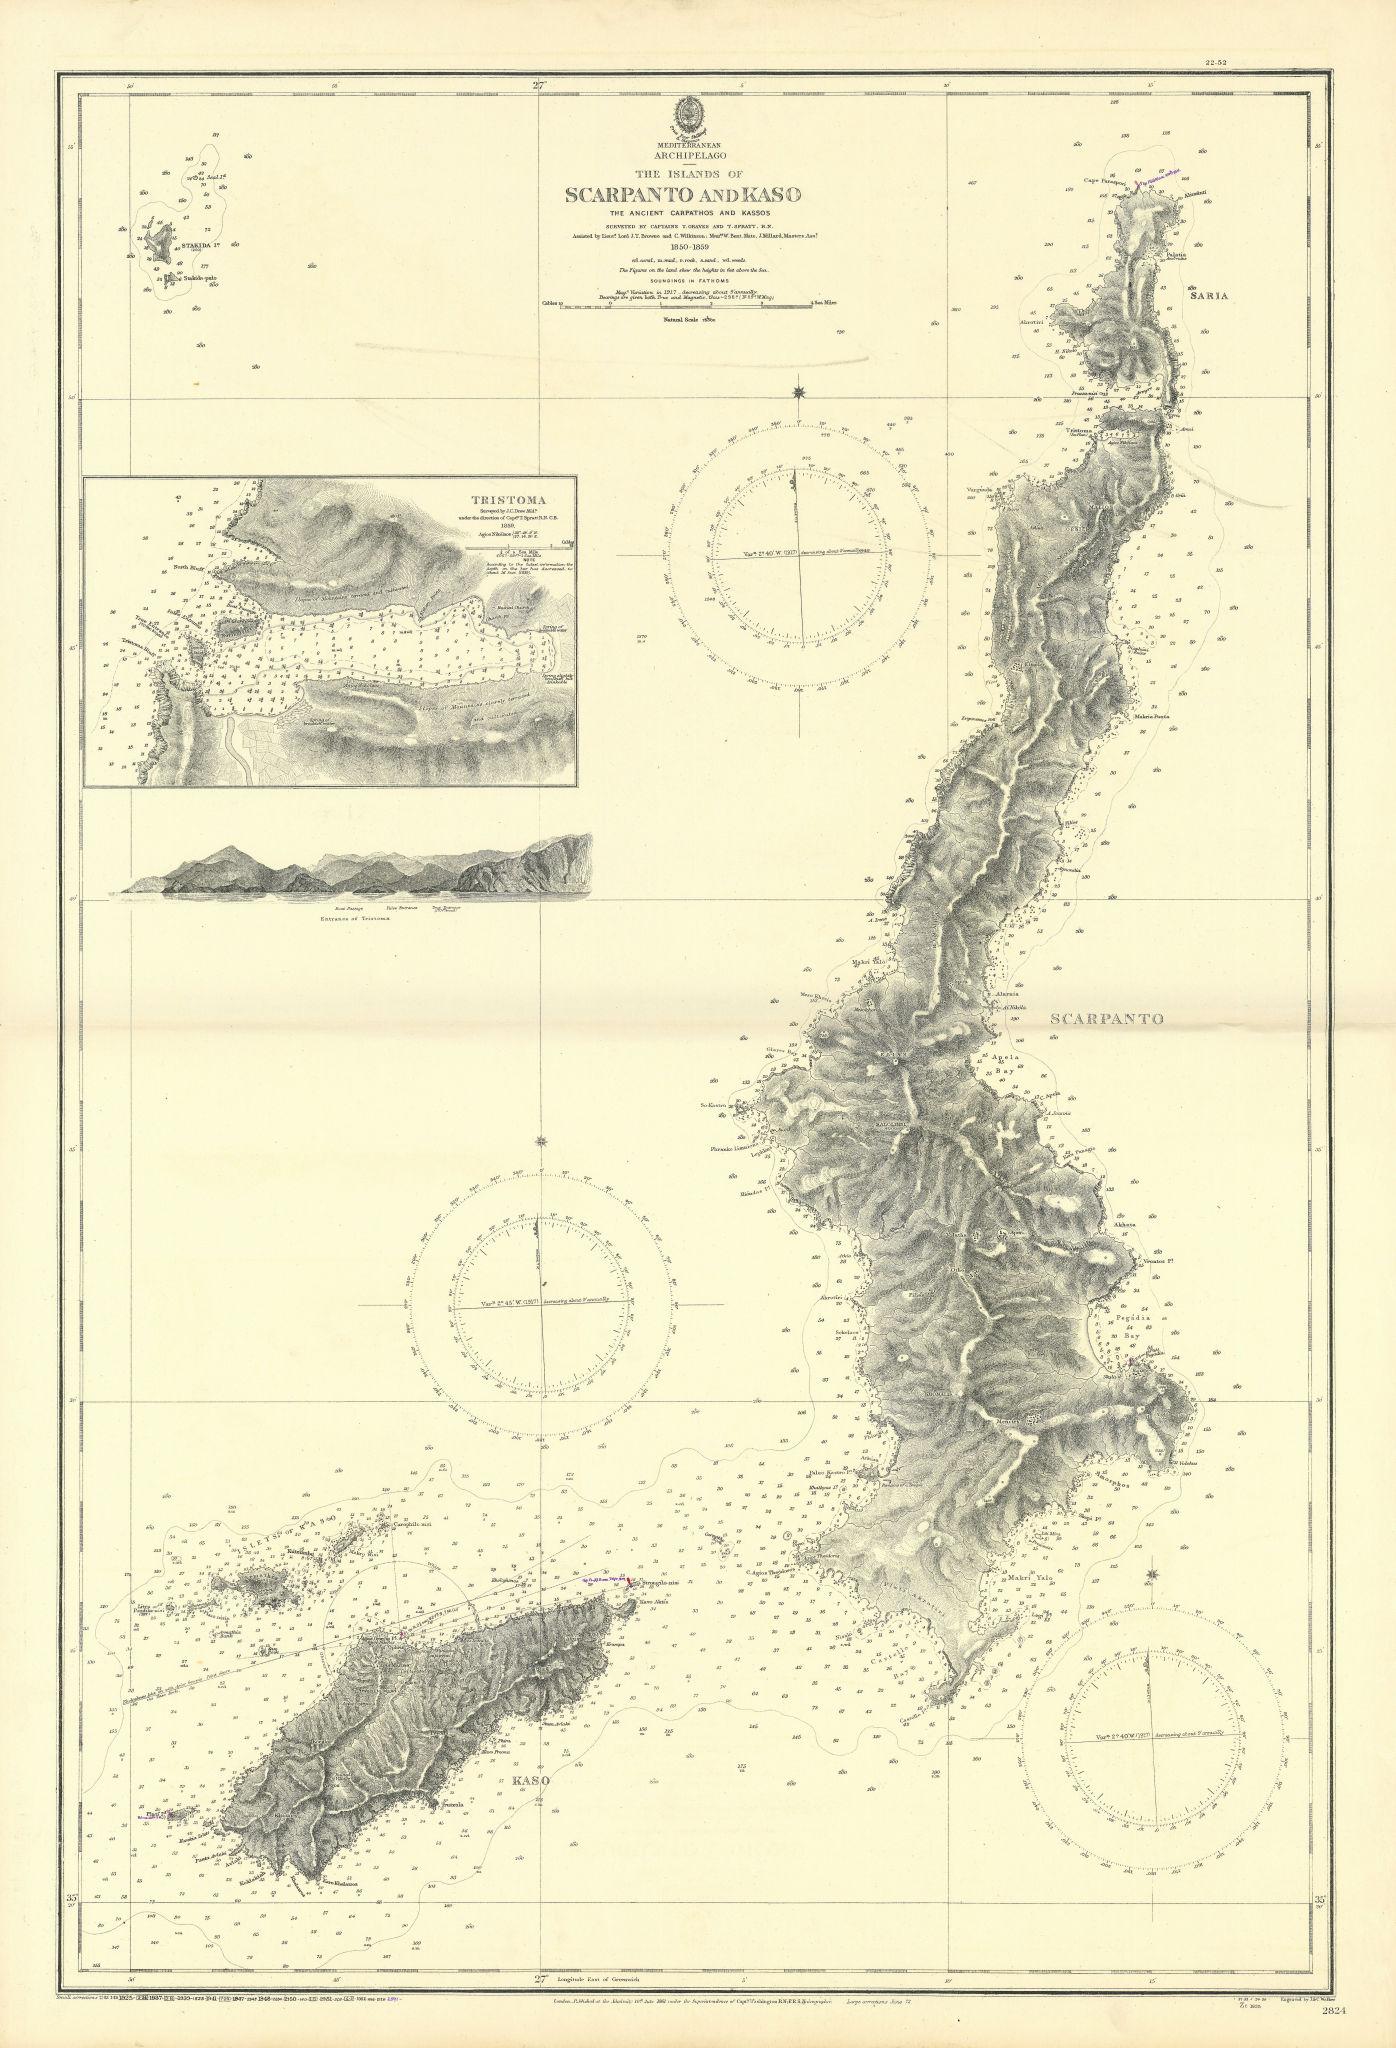 Karpathos Kasos. Tristoma Dodecanese Greece. ADMIRALTY sea chart 1861 (1952) map